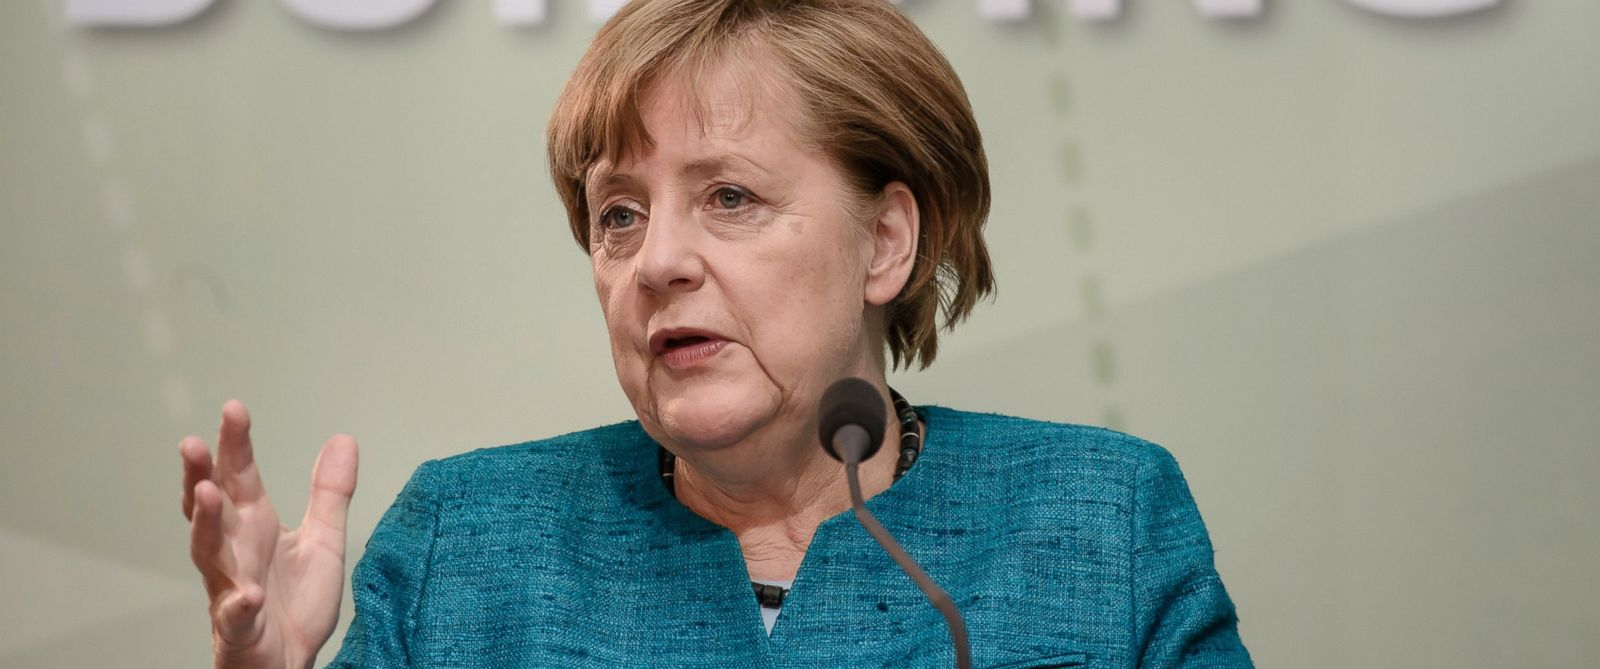 PHOTO: German Chancellor Angela Merkel speaks the Labor 20 Conference in Berlin, in Berlin, May 17, 2017.